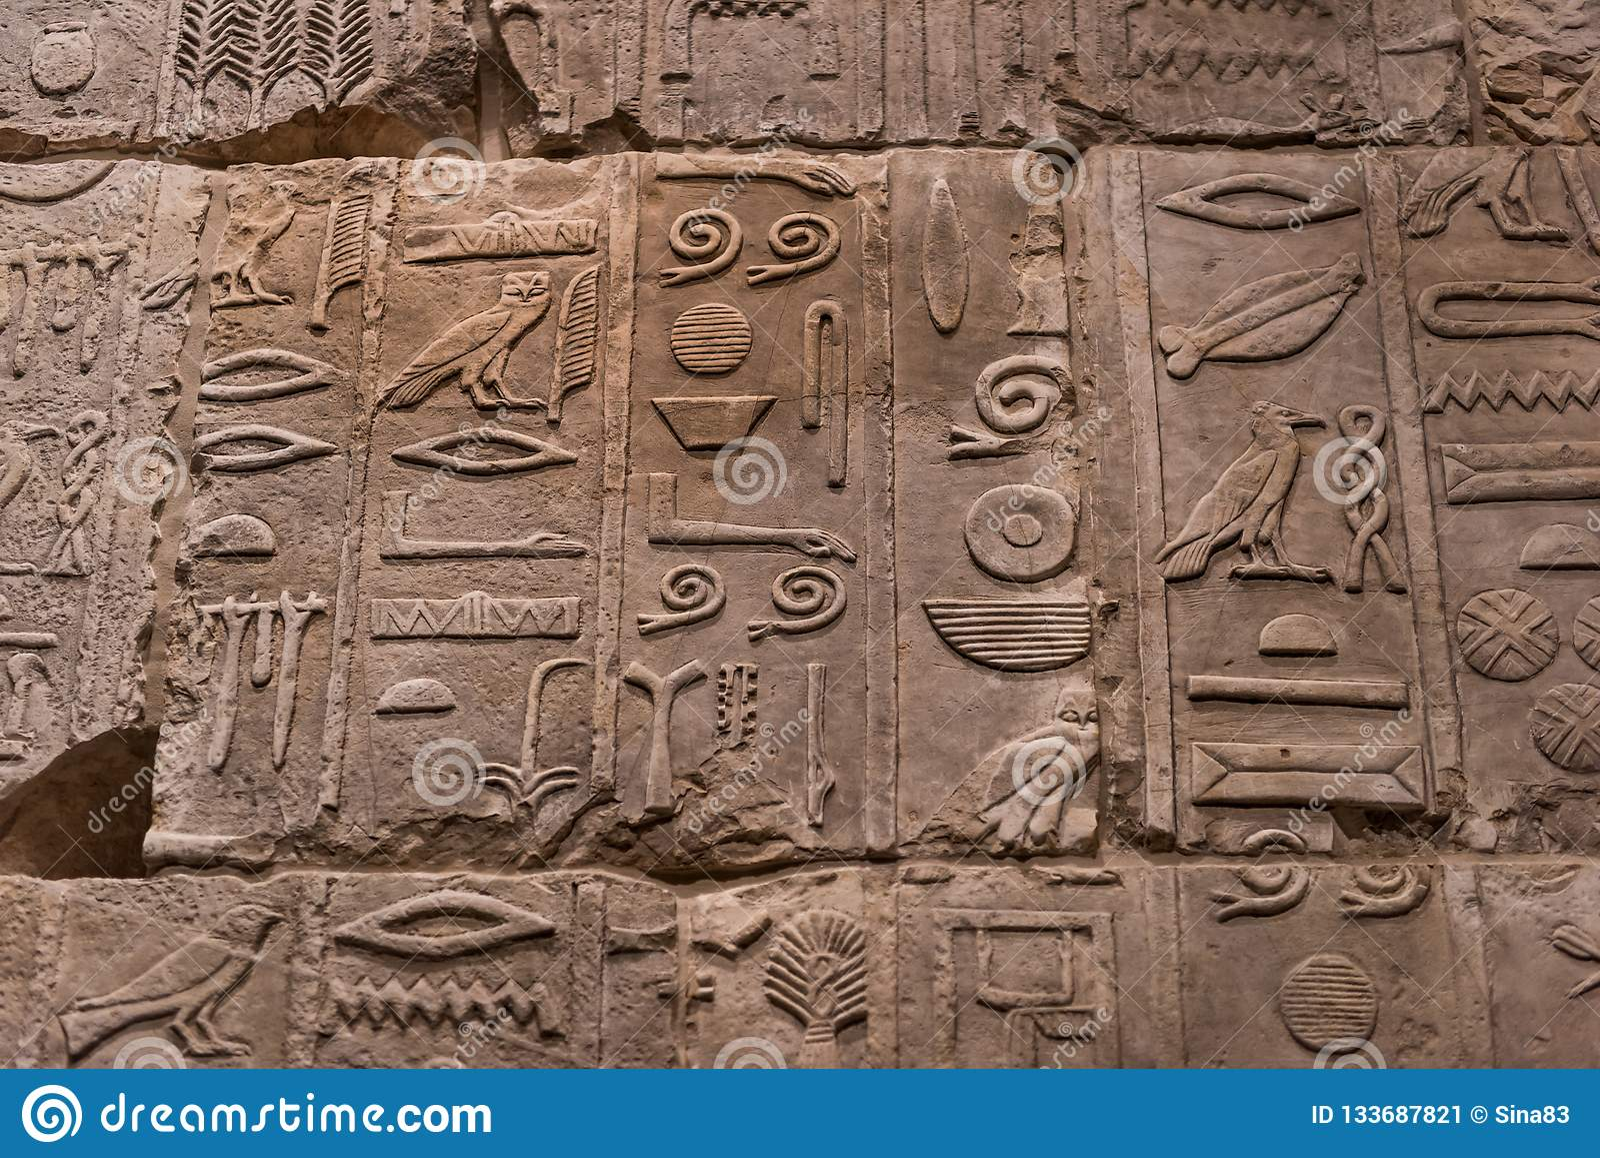 O caráter do hieróglifo egípcio na pedra